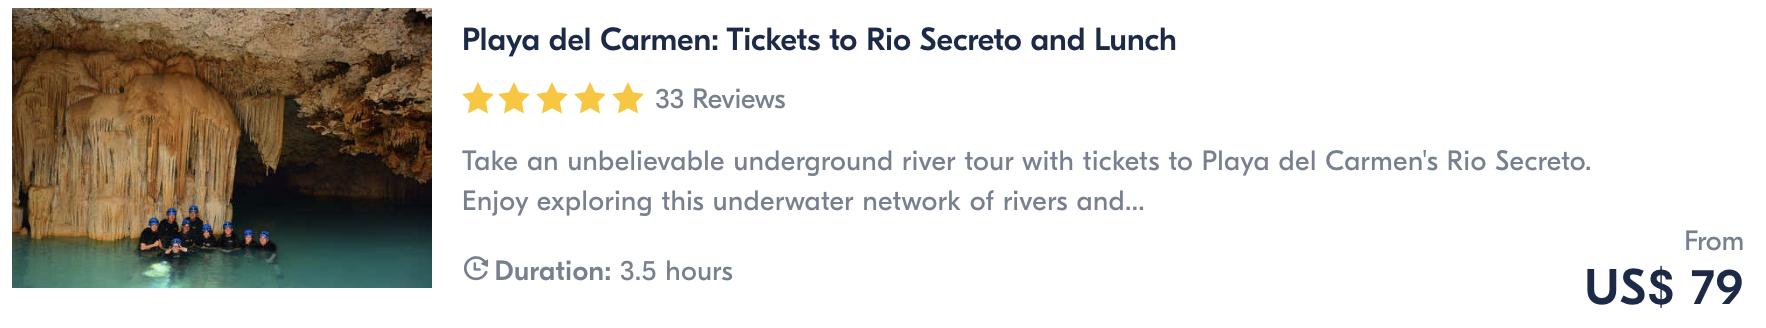 visiting rio secreto from playa del carmen mexico